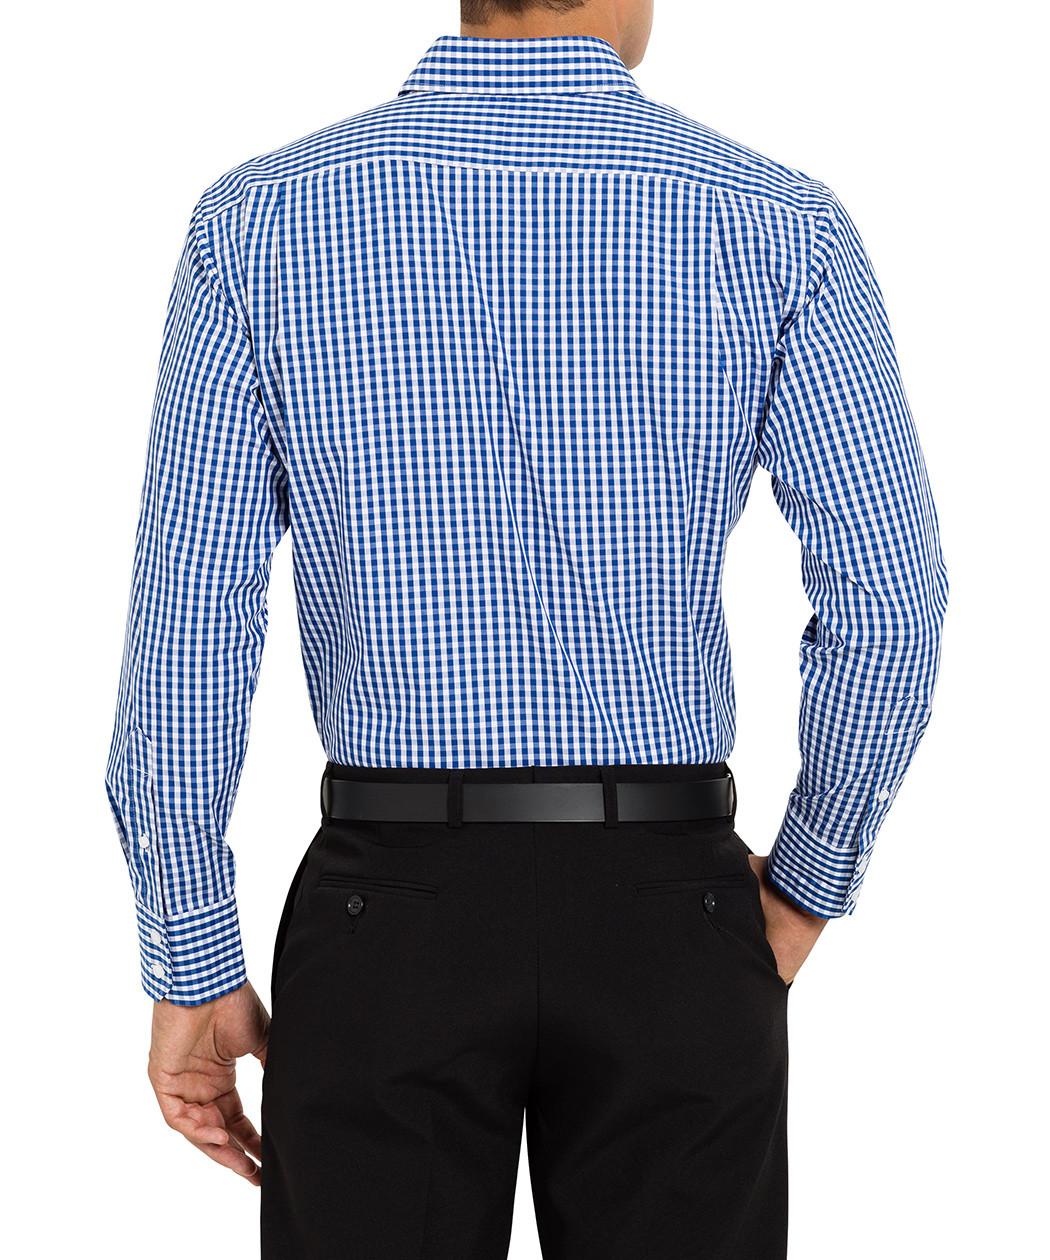 van heusen studio euro fit blue gingham shirt van heusen mens shirts